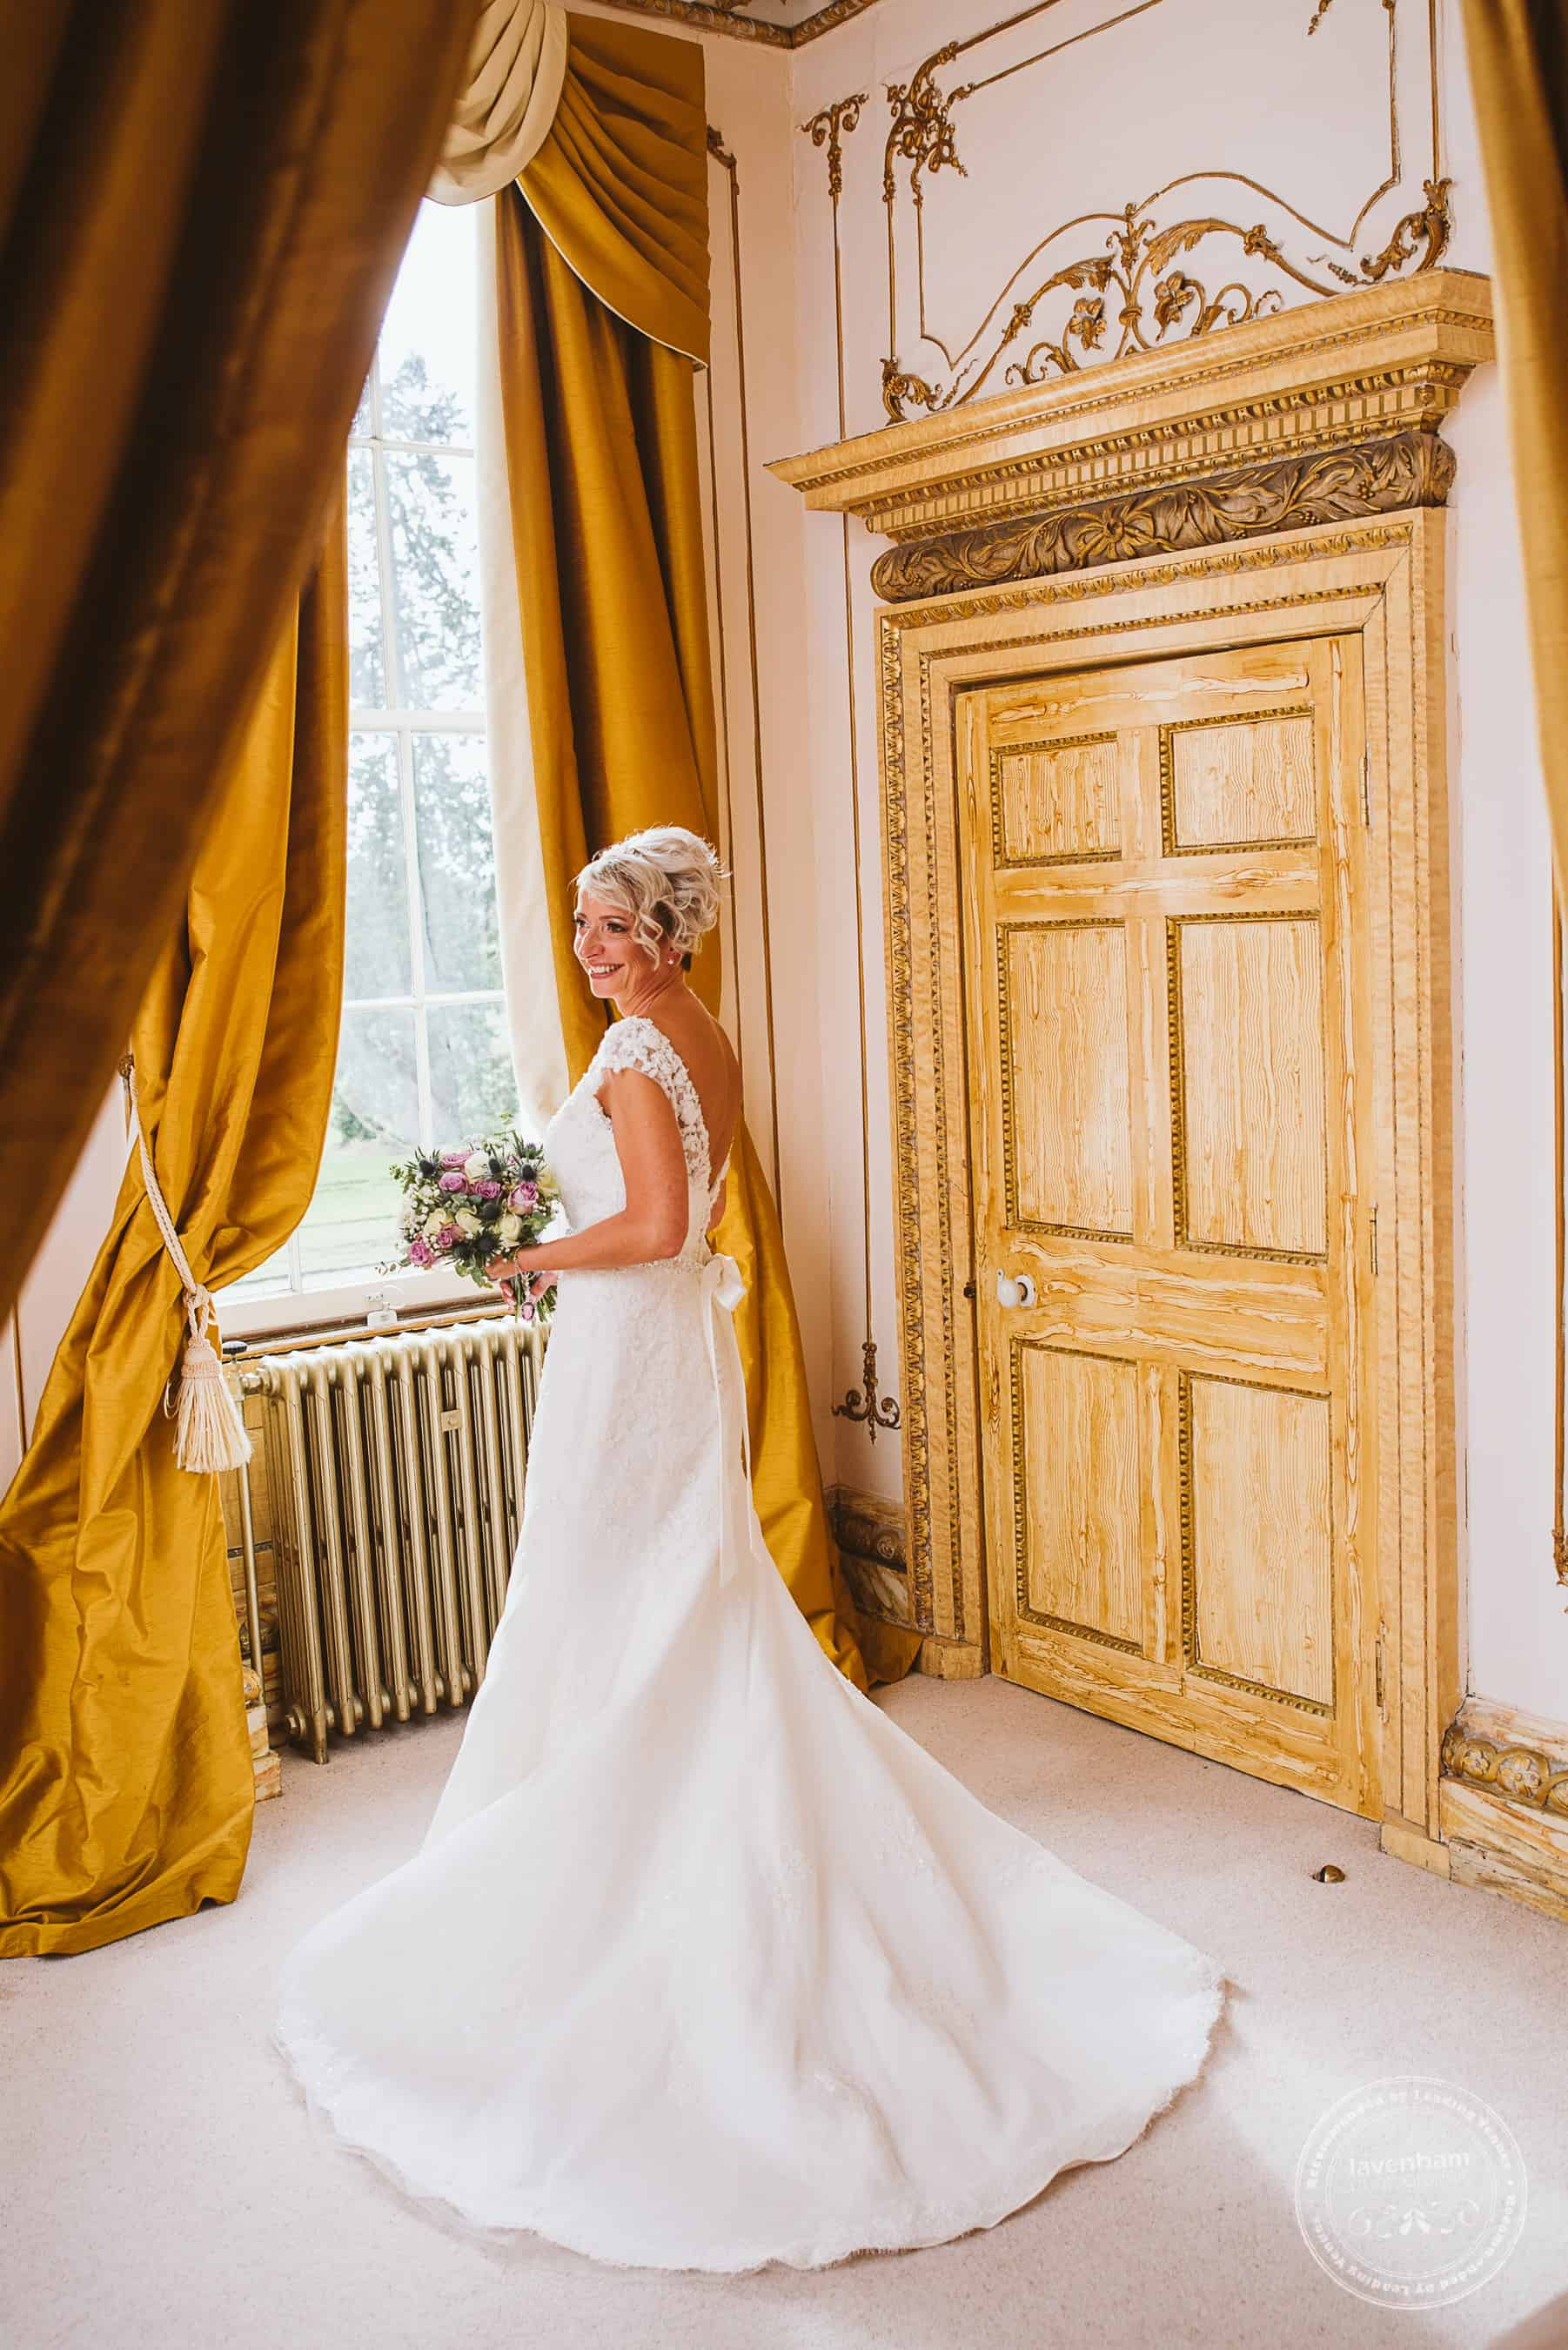 281018 Gosfield Hall Wedding Photography Lavenham Photographic 032